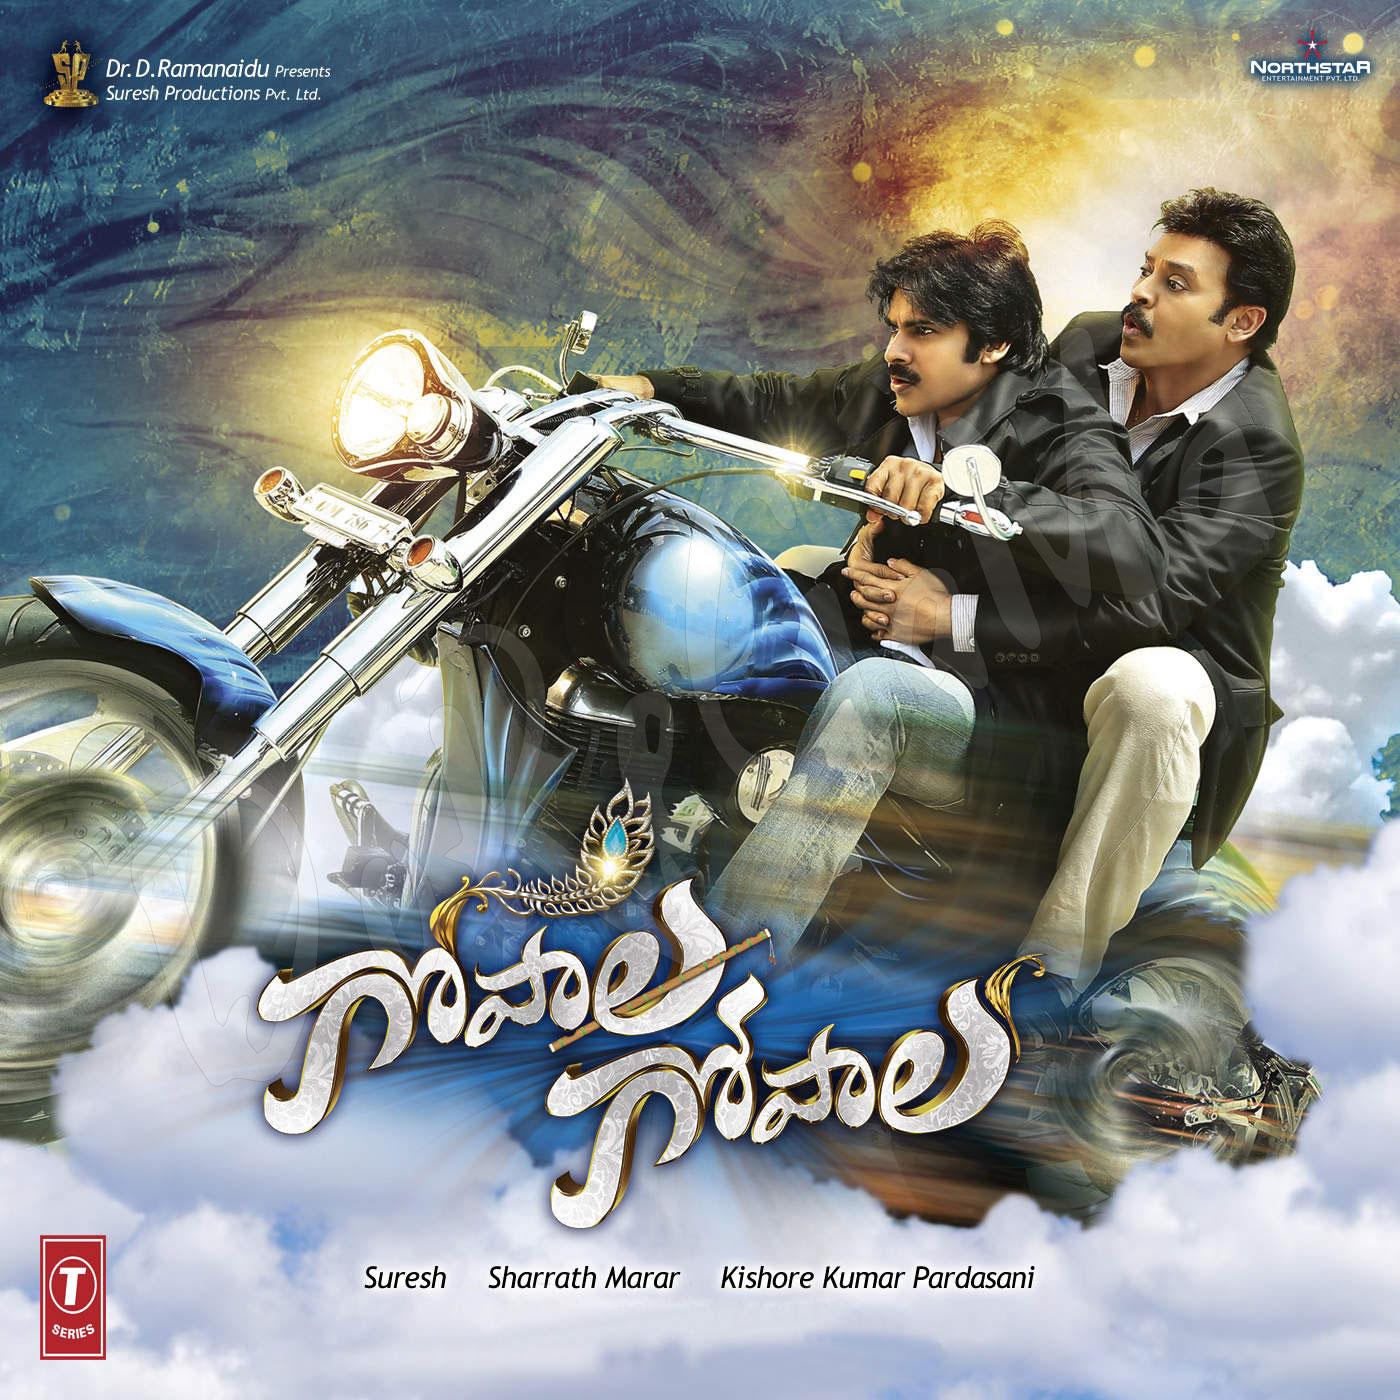 Gopala-Gopala-2015-Original-CD-Front-Cover-HD